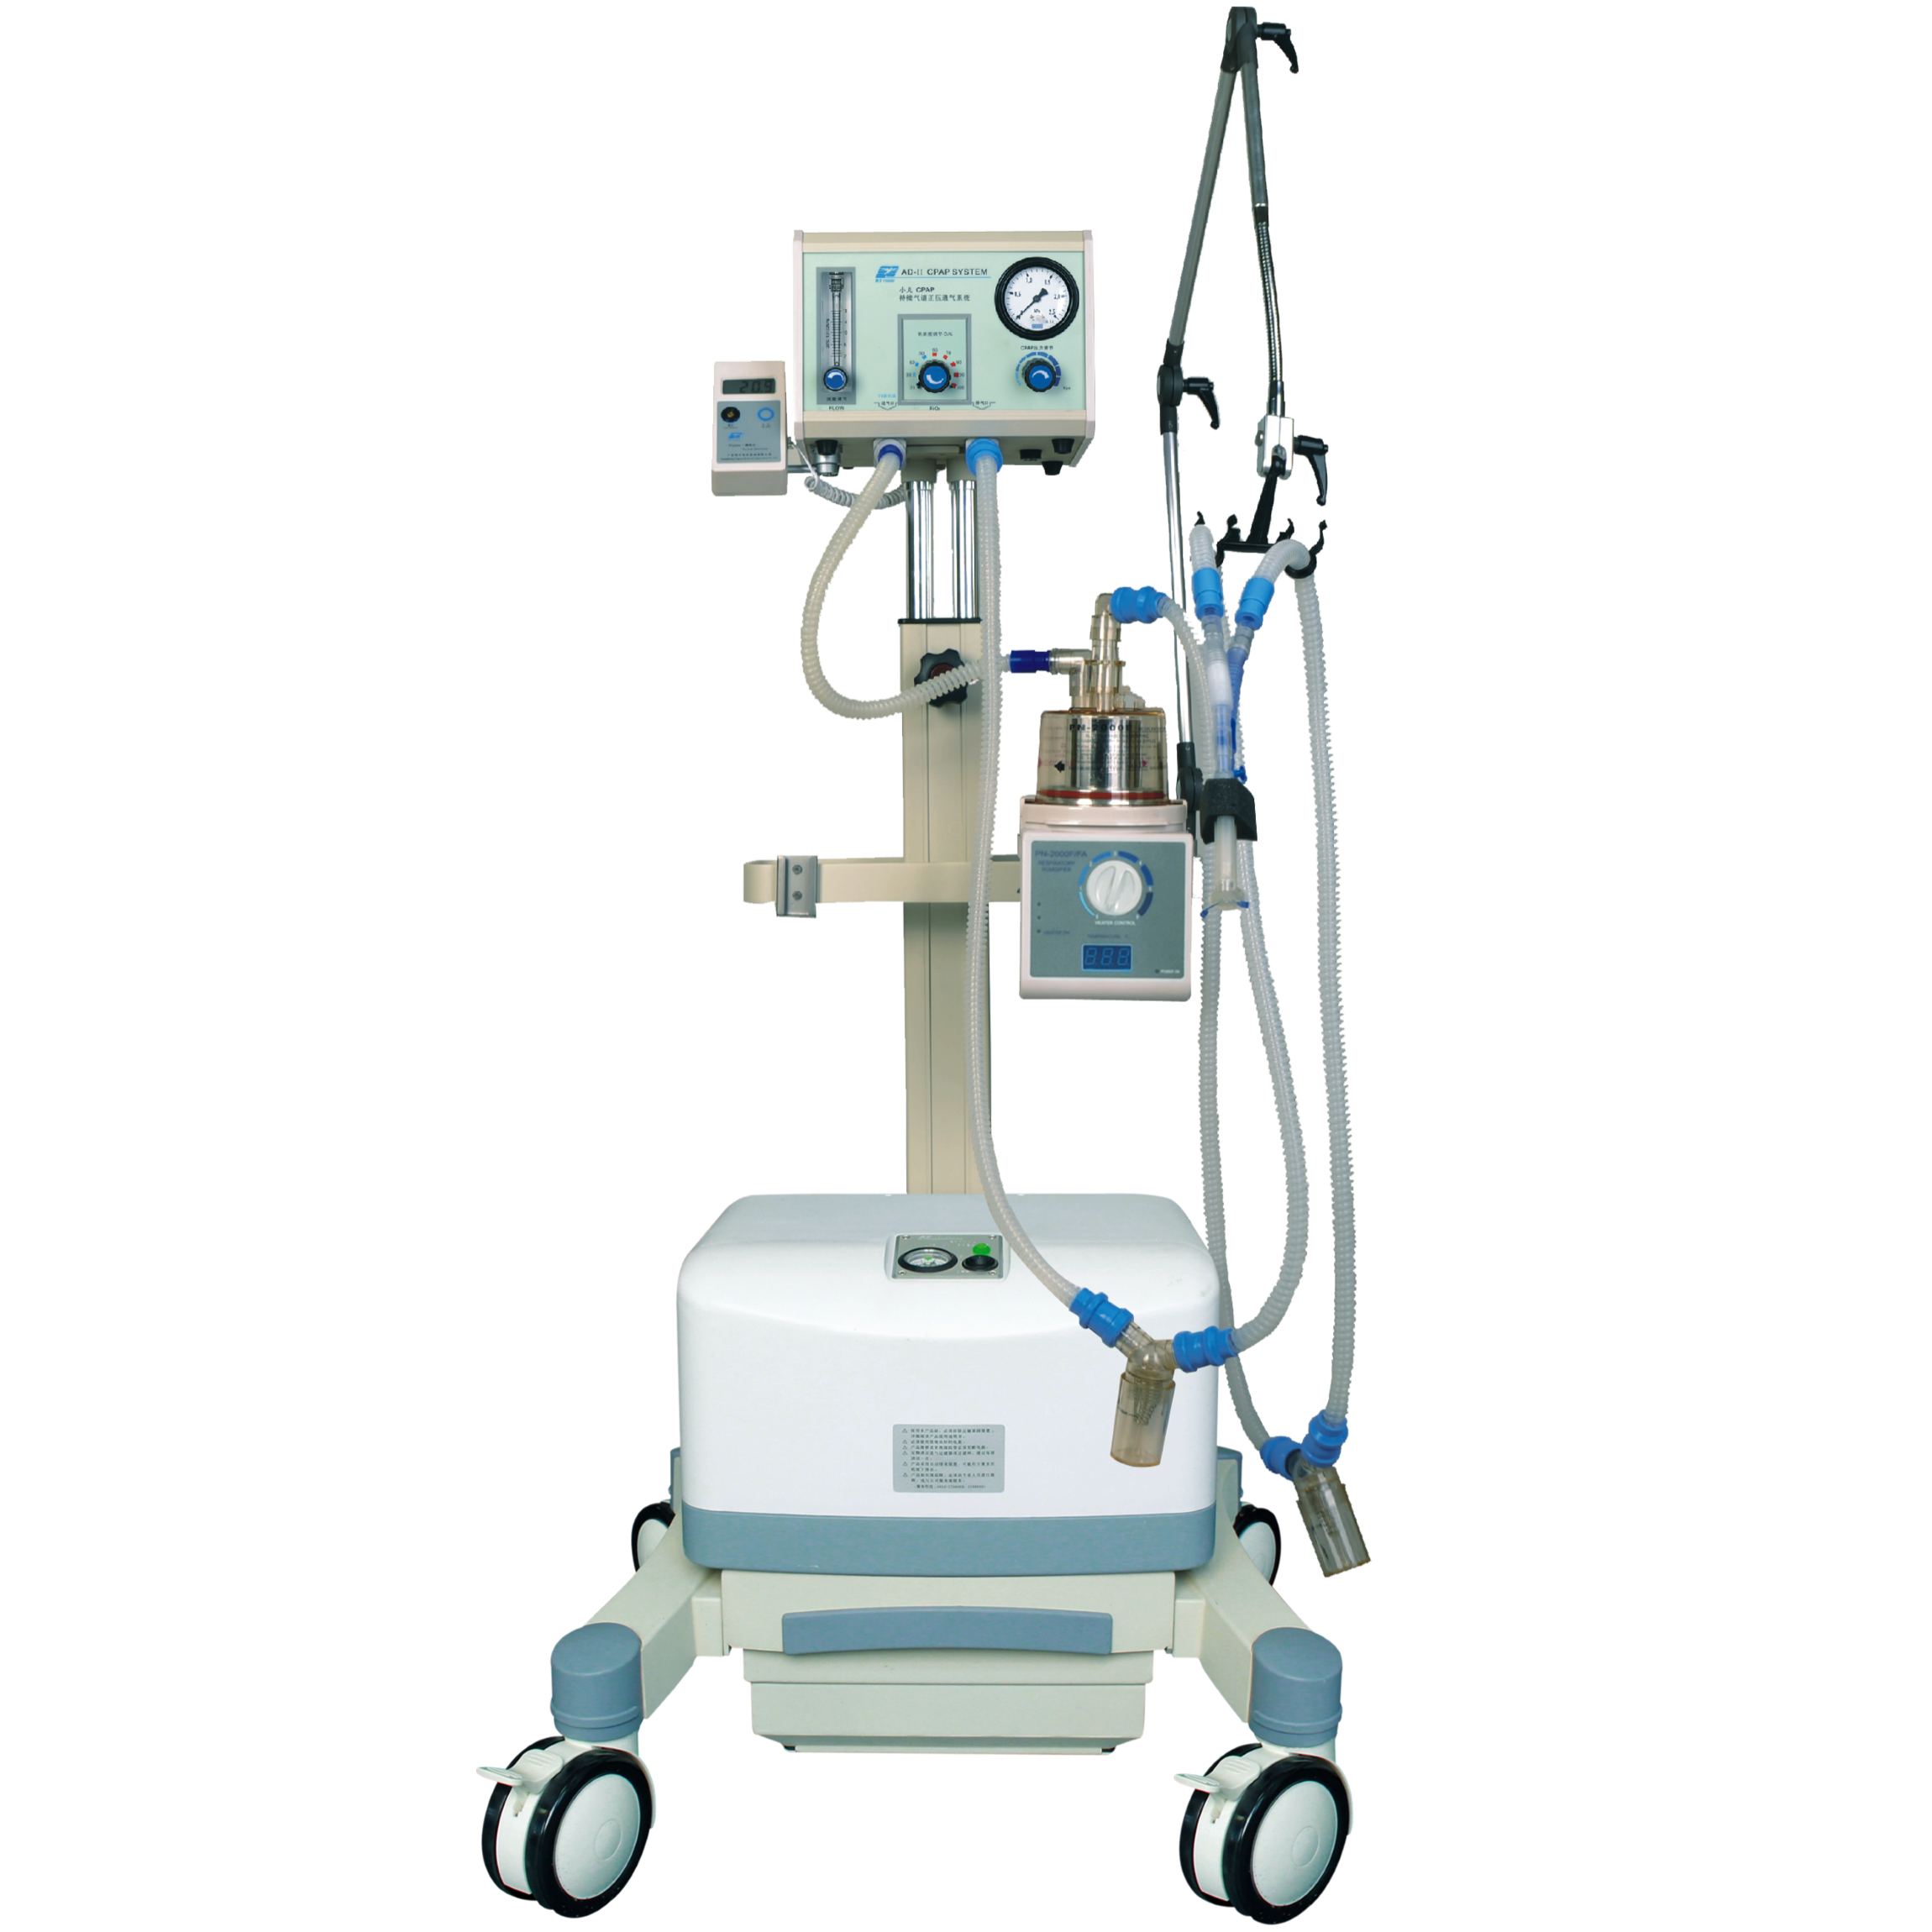 Universal pediatric emergency respiratory system AD-II for ICU - KingCare | KingCare.net